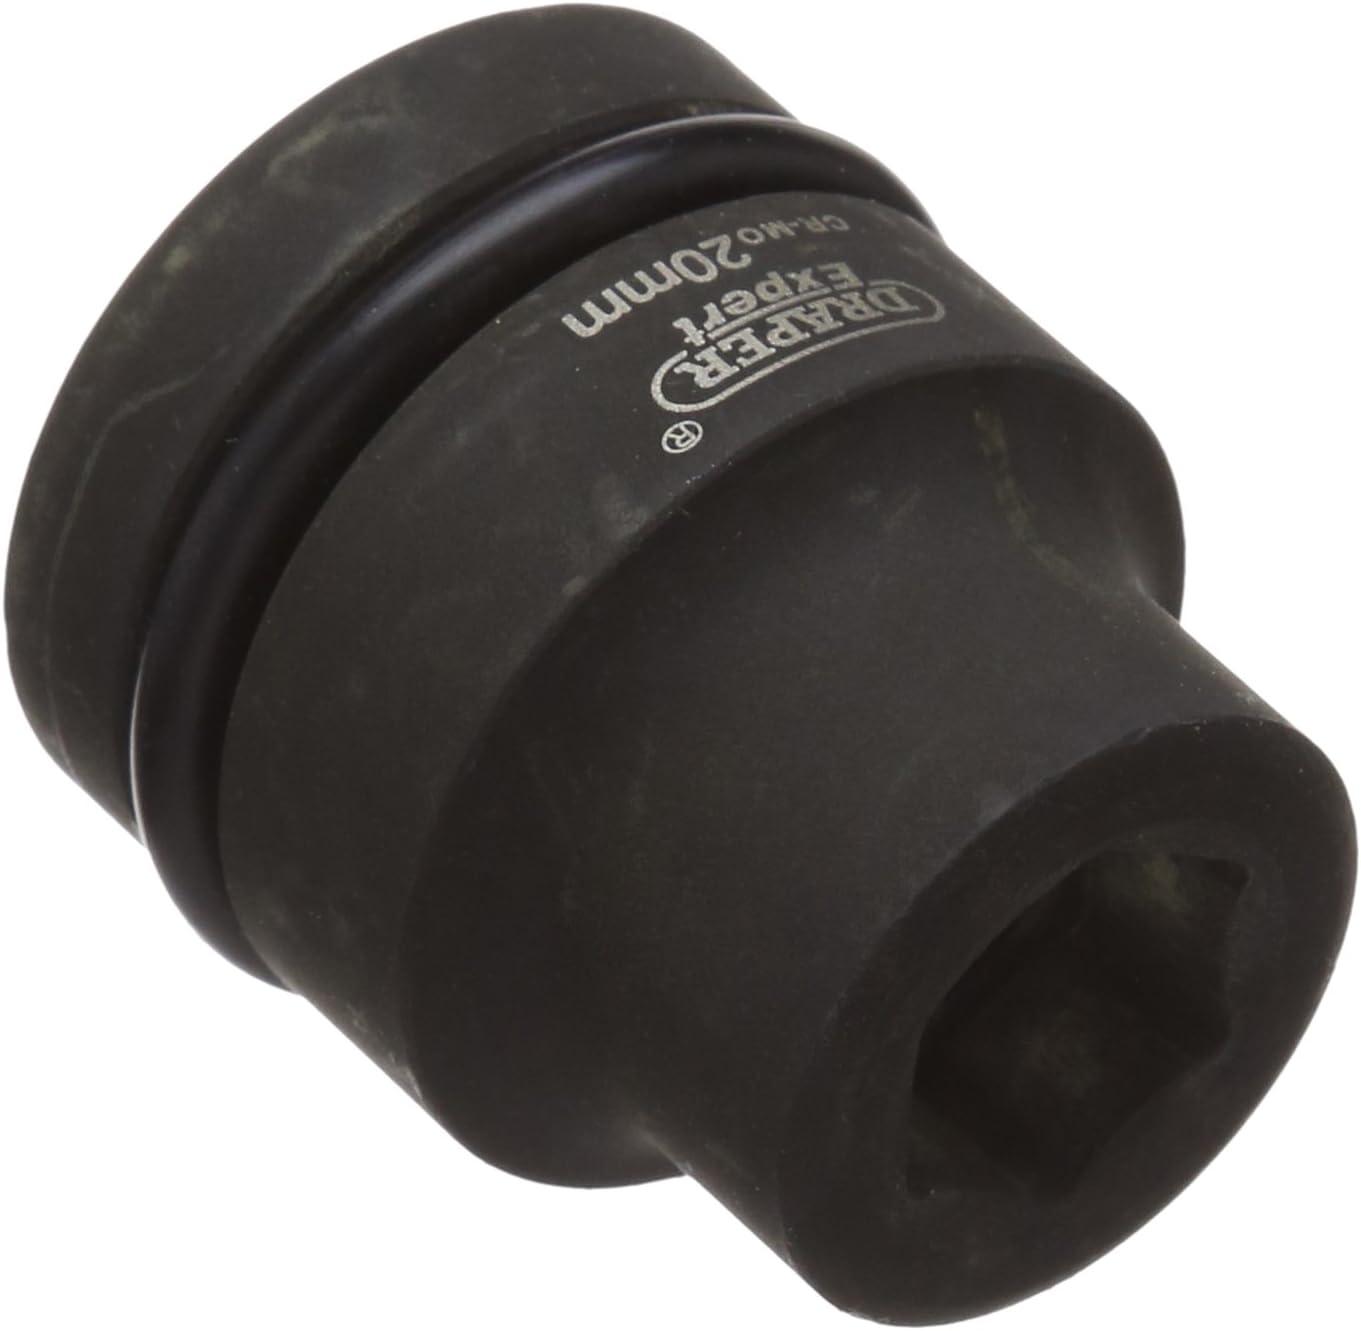 Draper Expert 5124 46mm 1-inch Square Drive Hi-Torq 6-Point Impact Socket